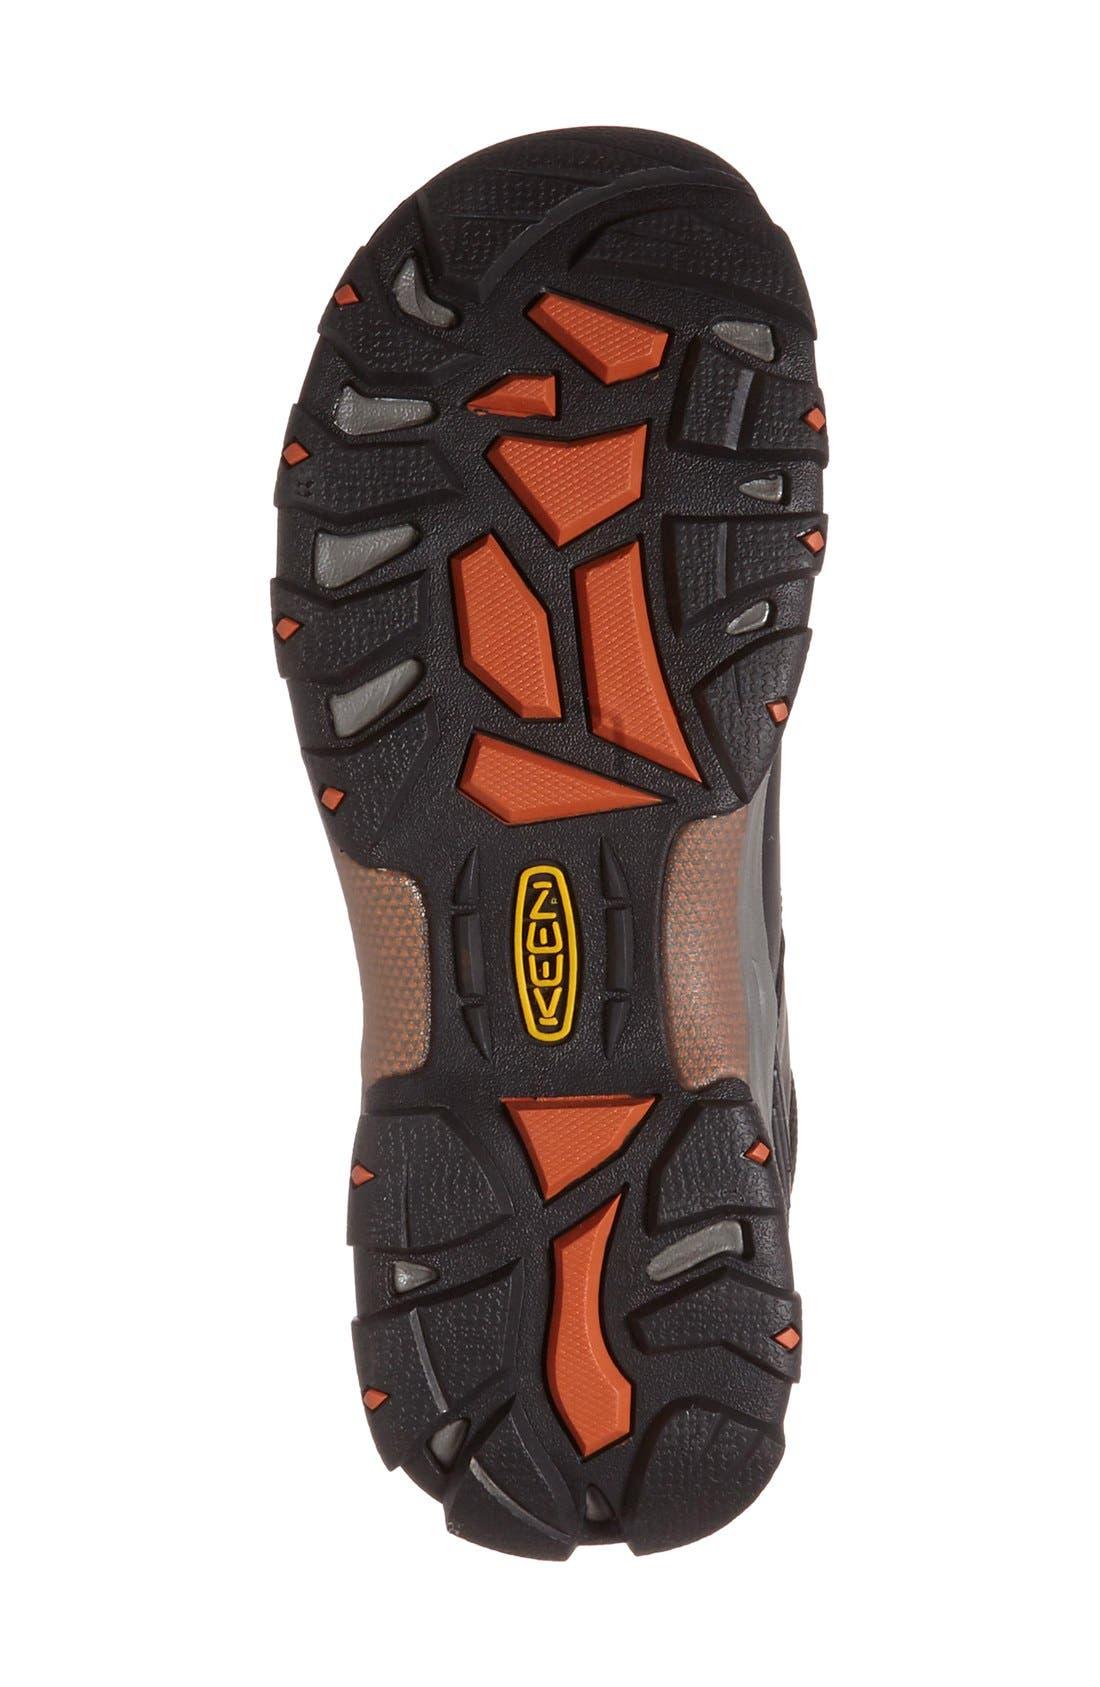 Gypsum II Waterproof Hiking Boot,                             Alternate thumbnail 4, color,                             BLACK NUBUCK LEATHER